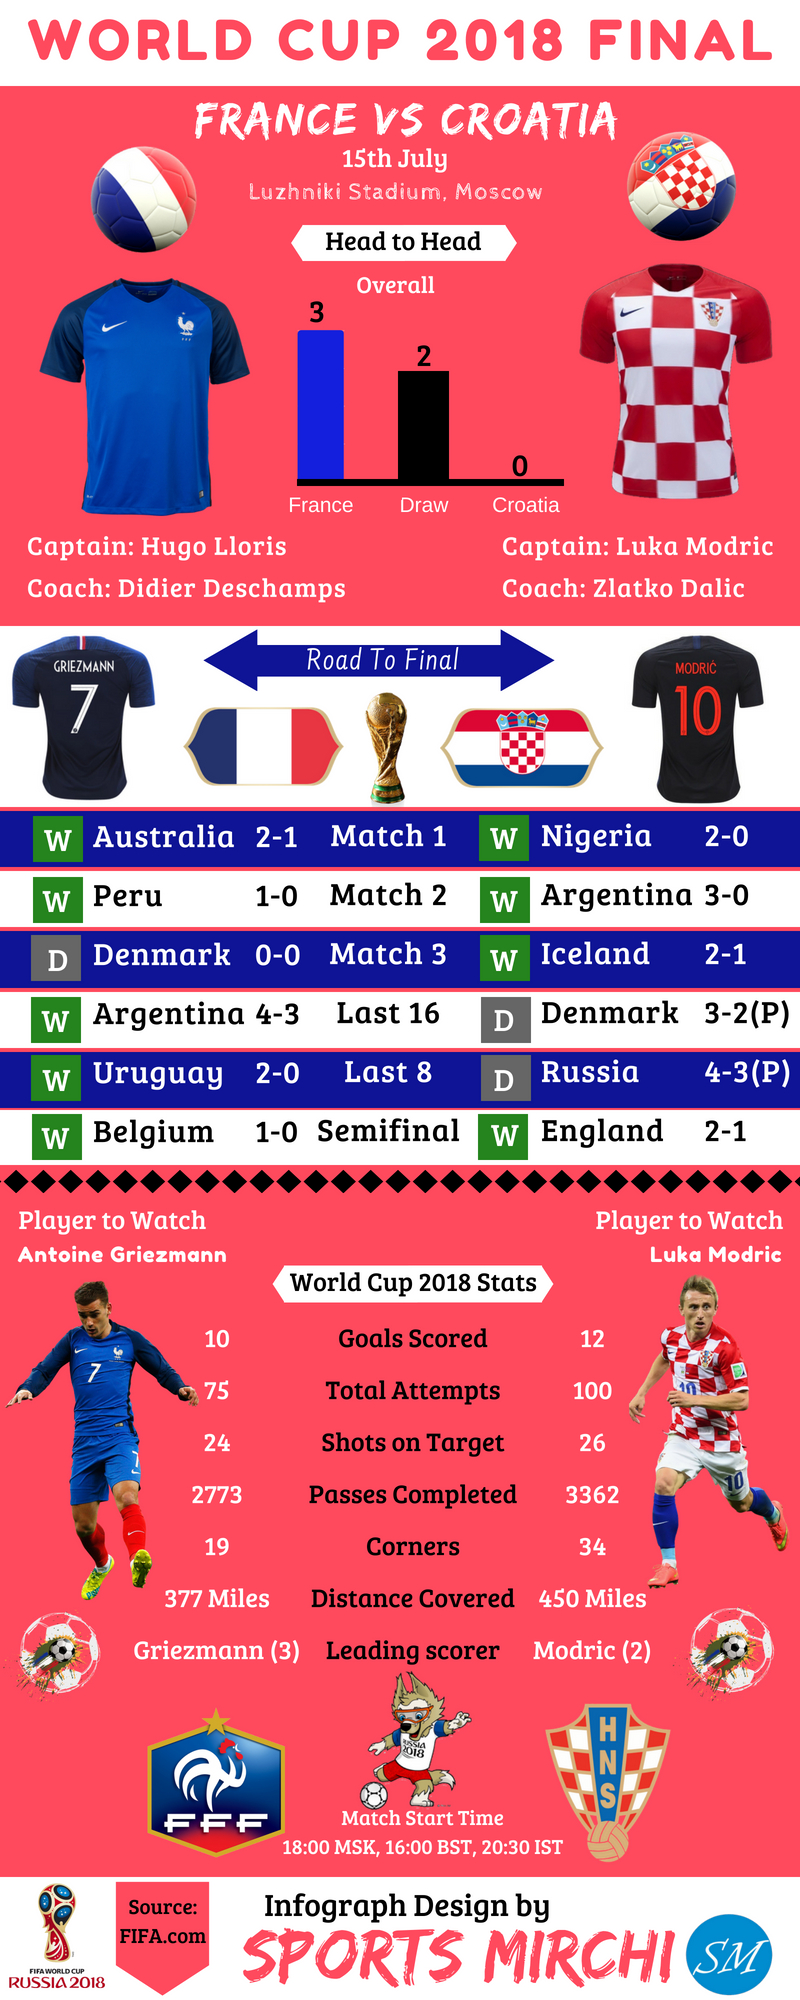 france vs croatia - photo #27